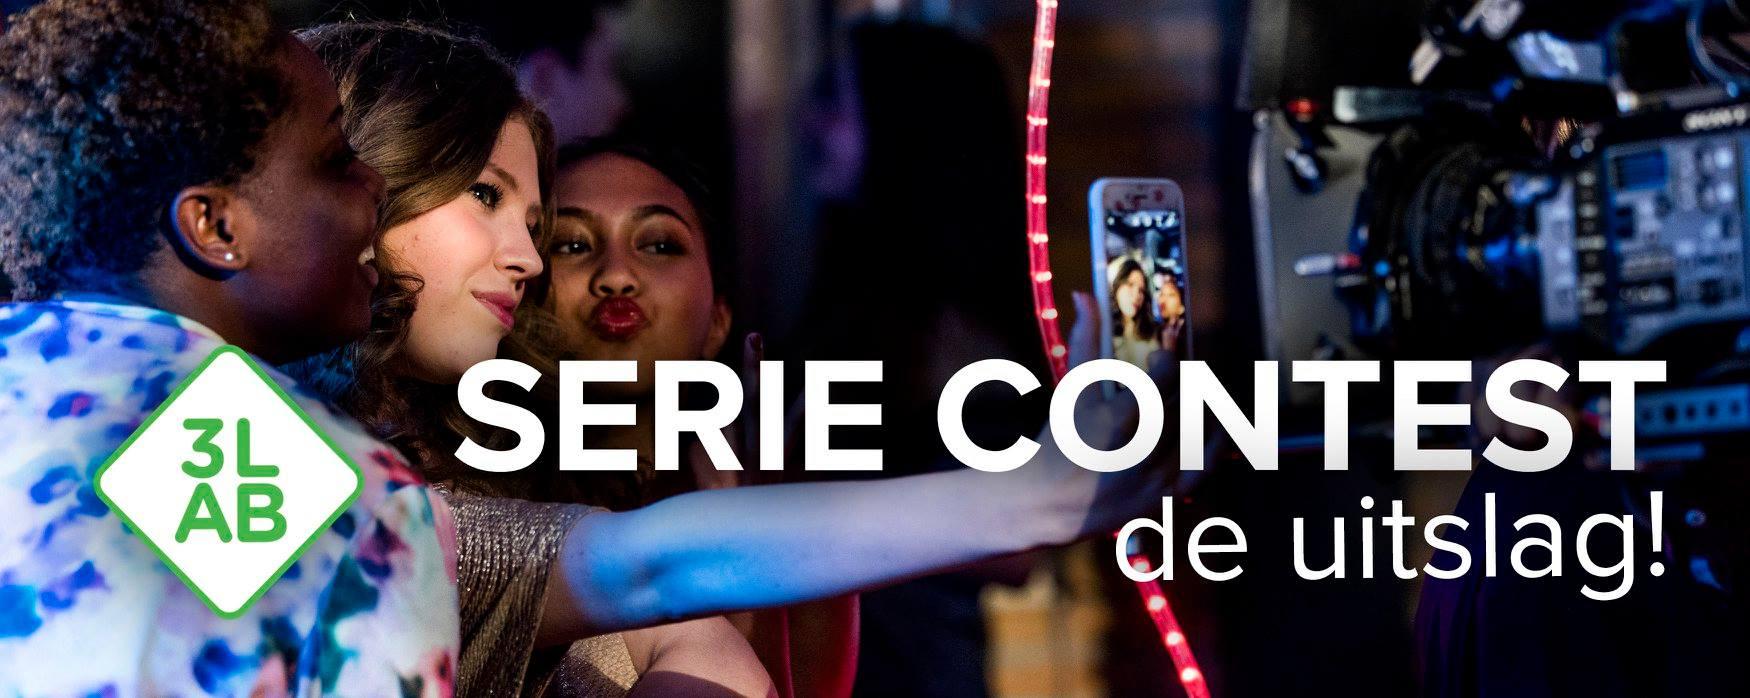 GAPPIES -  Serie Contest.jpg